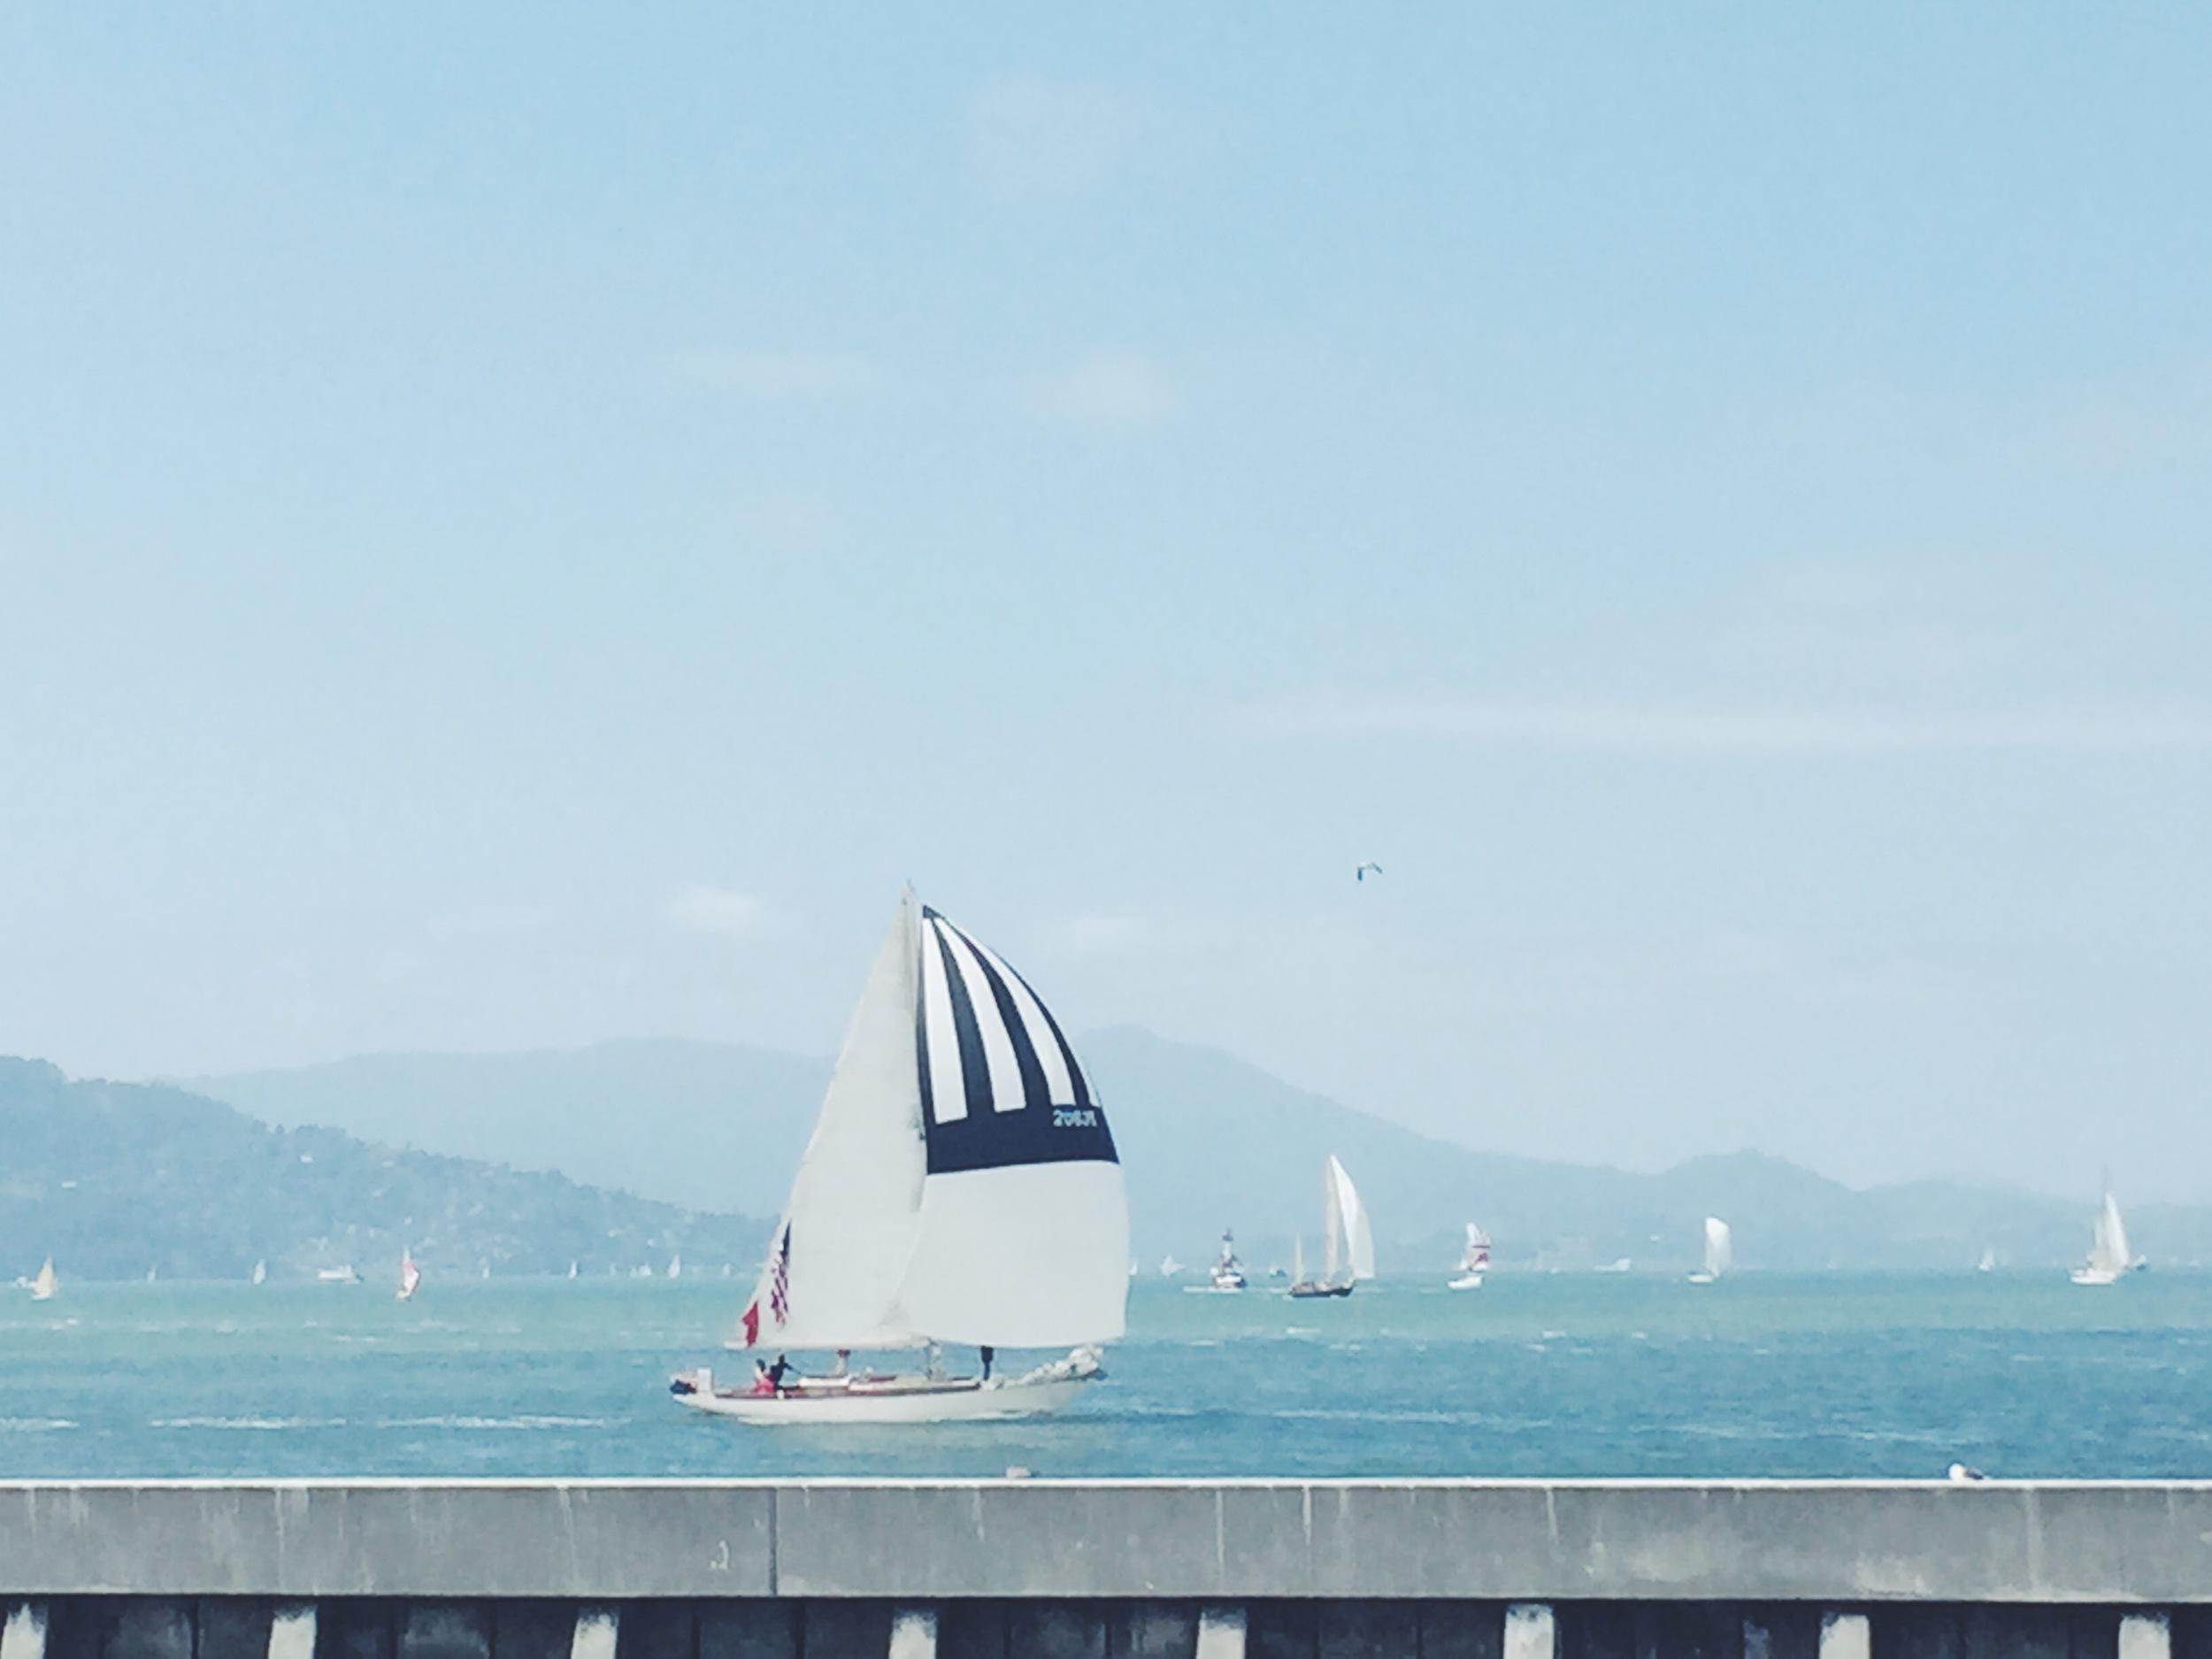 Pier 39 - Sailboat